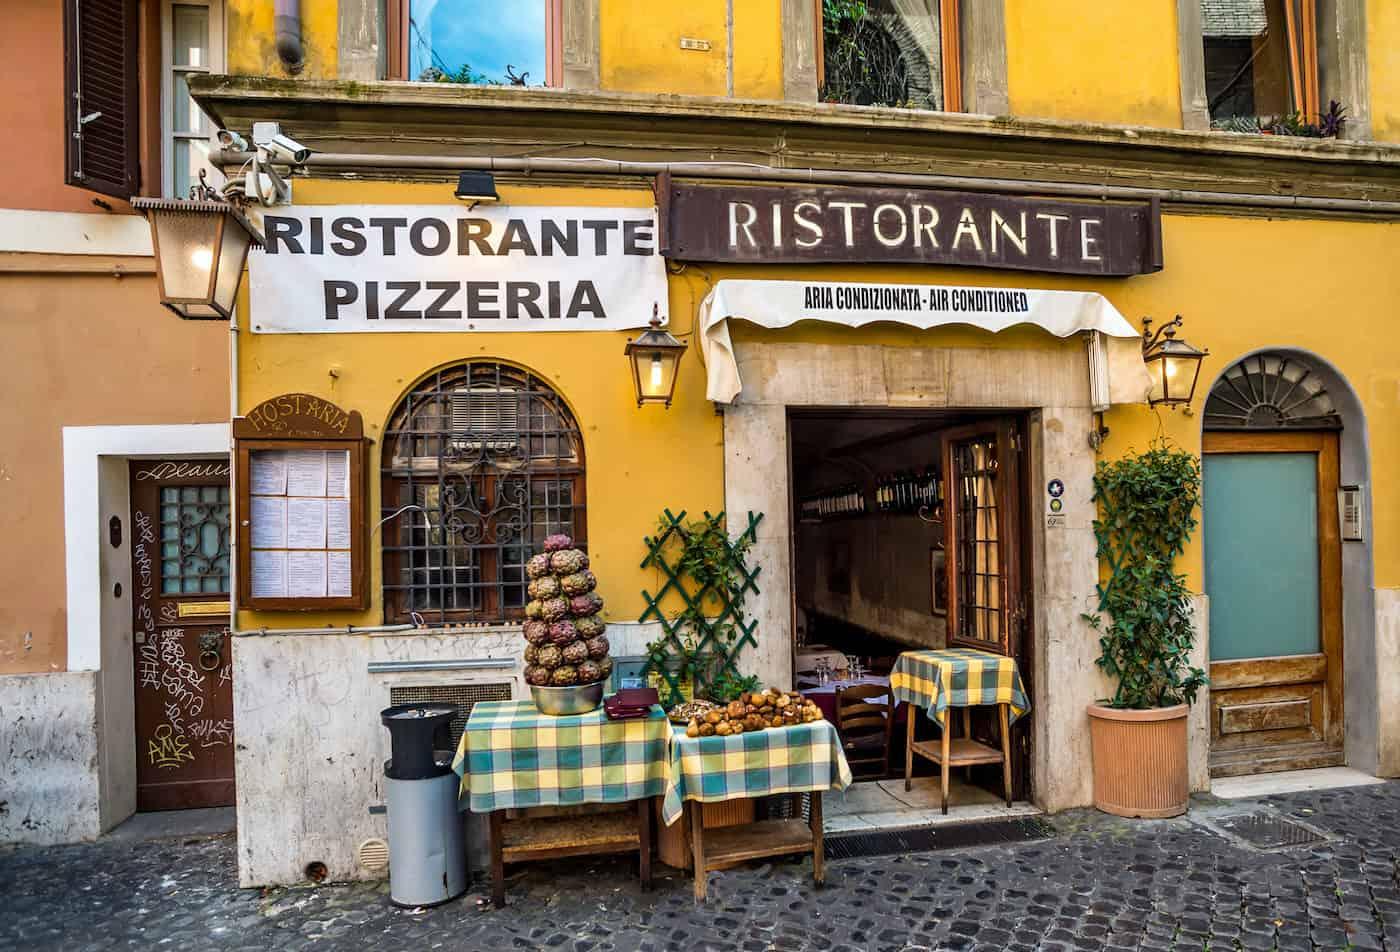 Restaurant entrance at Trastevere area